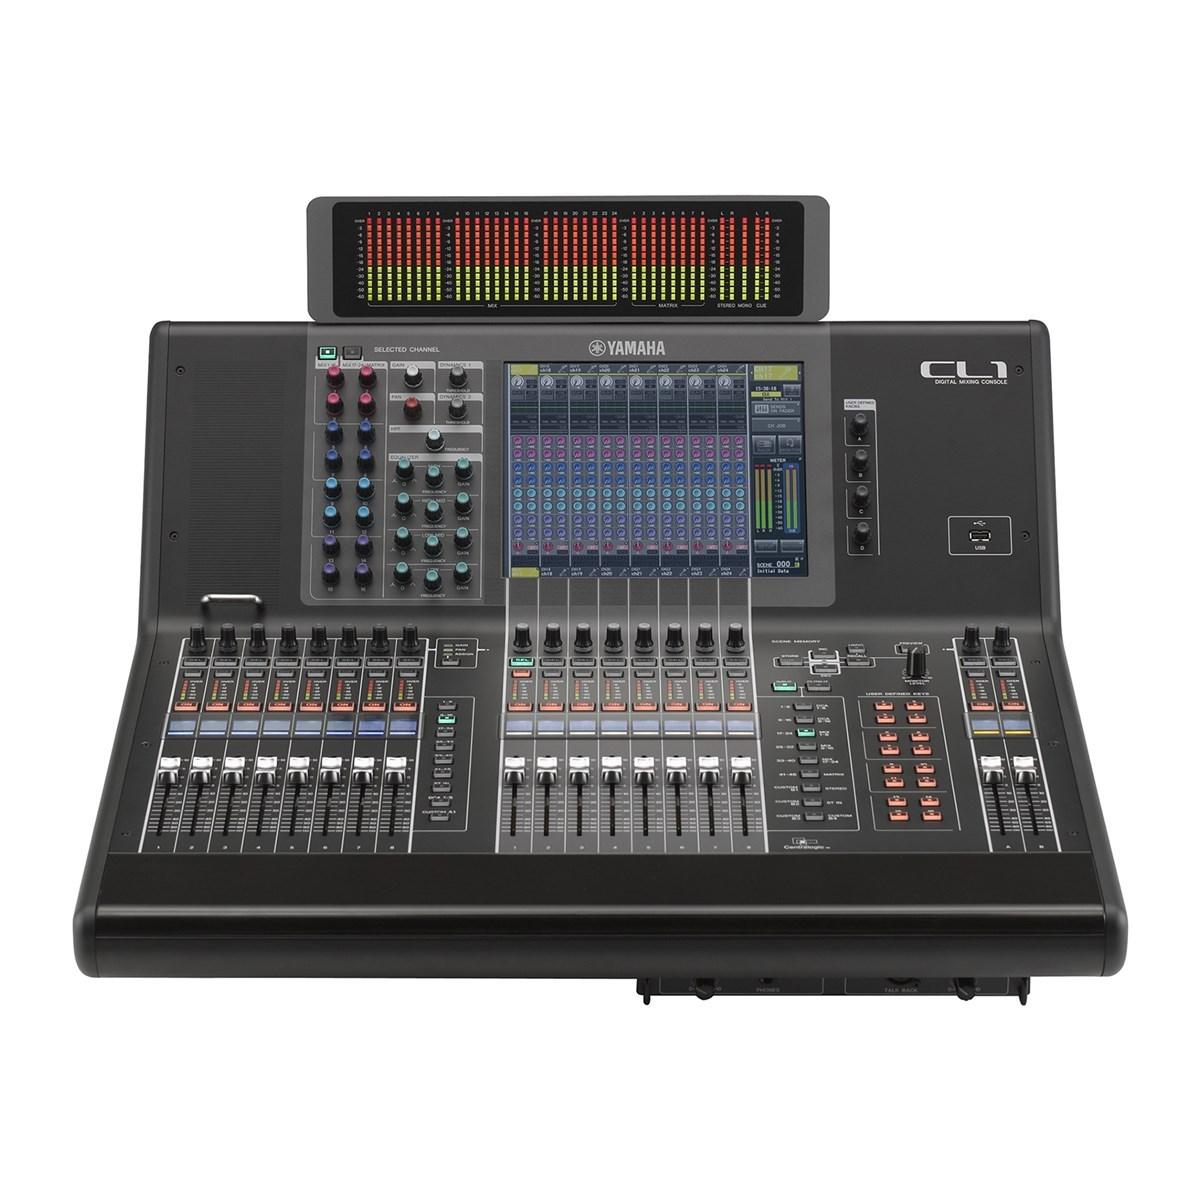 série-CL-Yamaha-mesa-de-som-digital-cl1